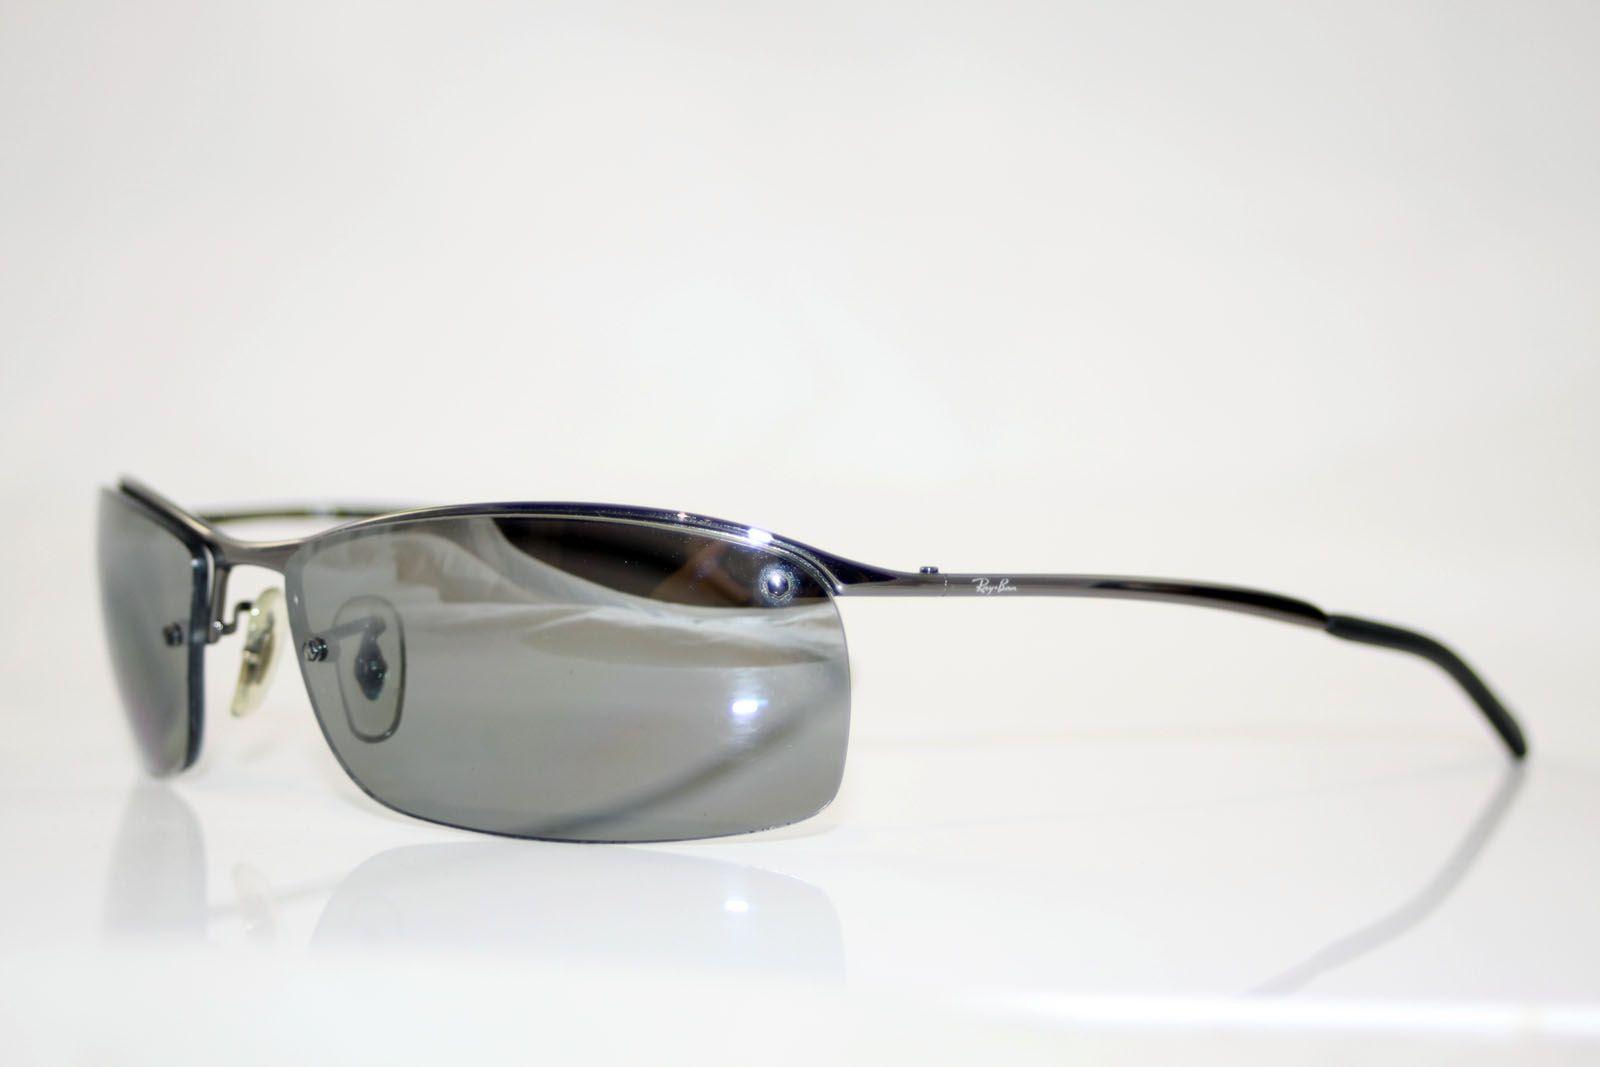 ray ban 3043 black men's polarized sunglasses